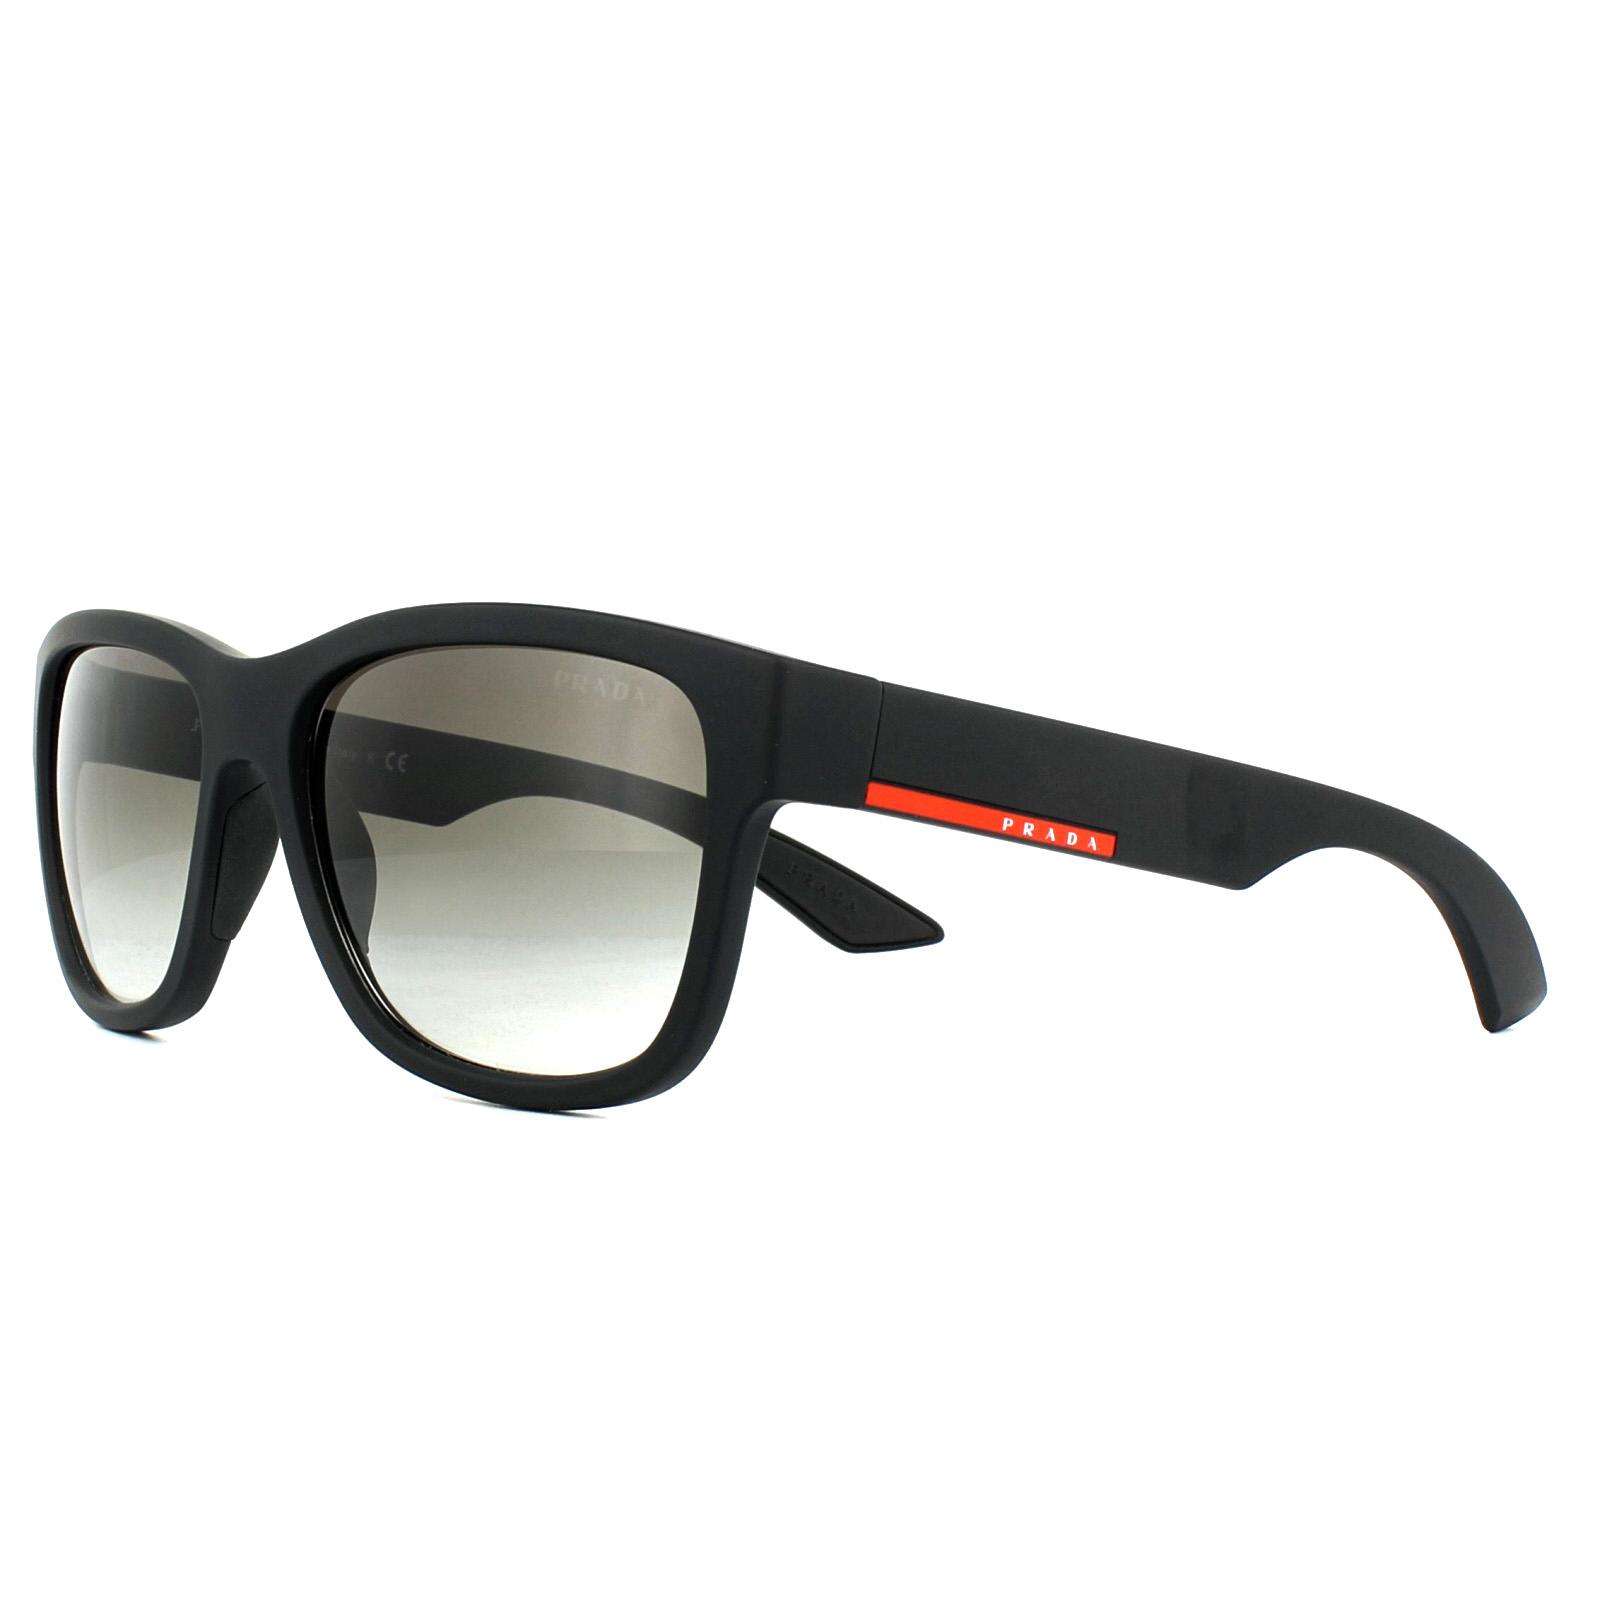 bc2616e54436e Sentinel Prada Sport Sunglasses PS03QS DG00A7 Black Rubber Grey Gradient